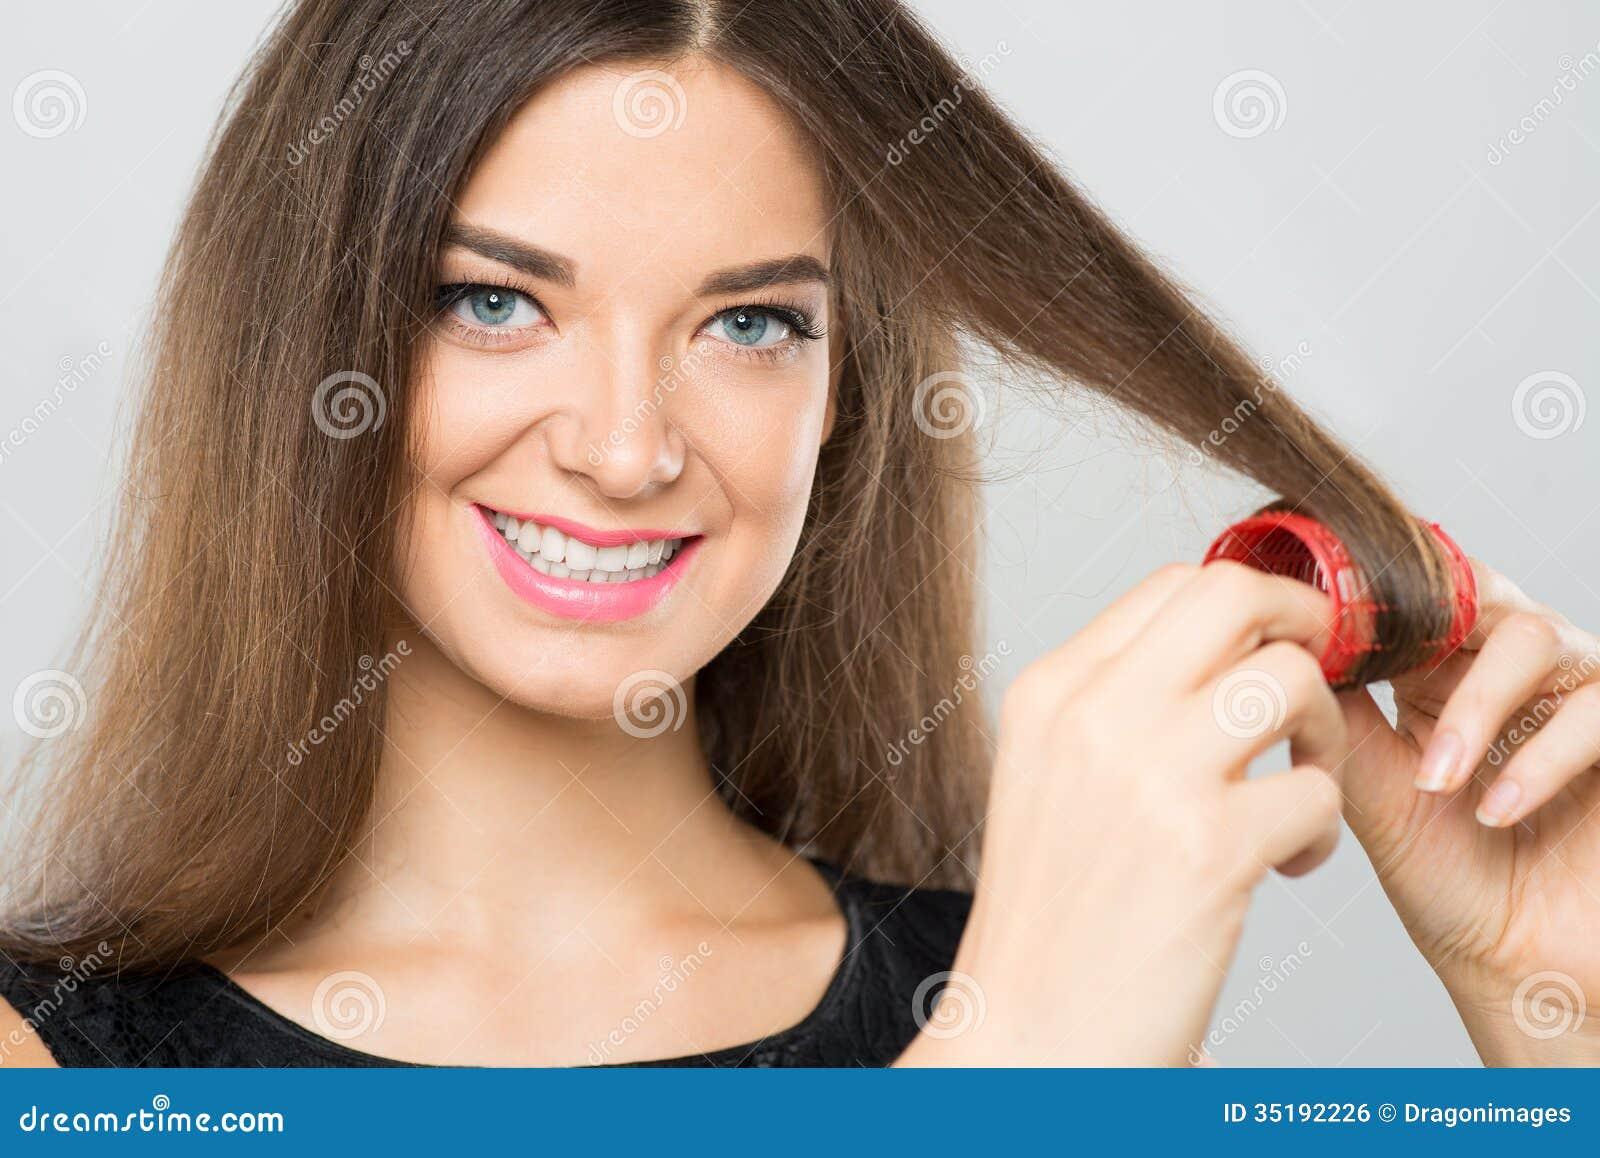 natural hair dye edmonton